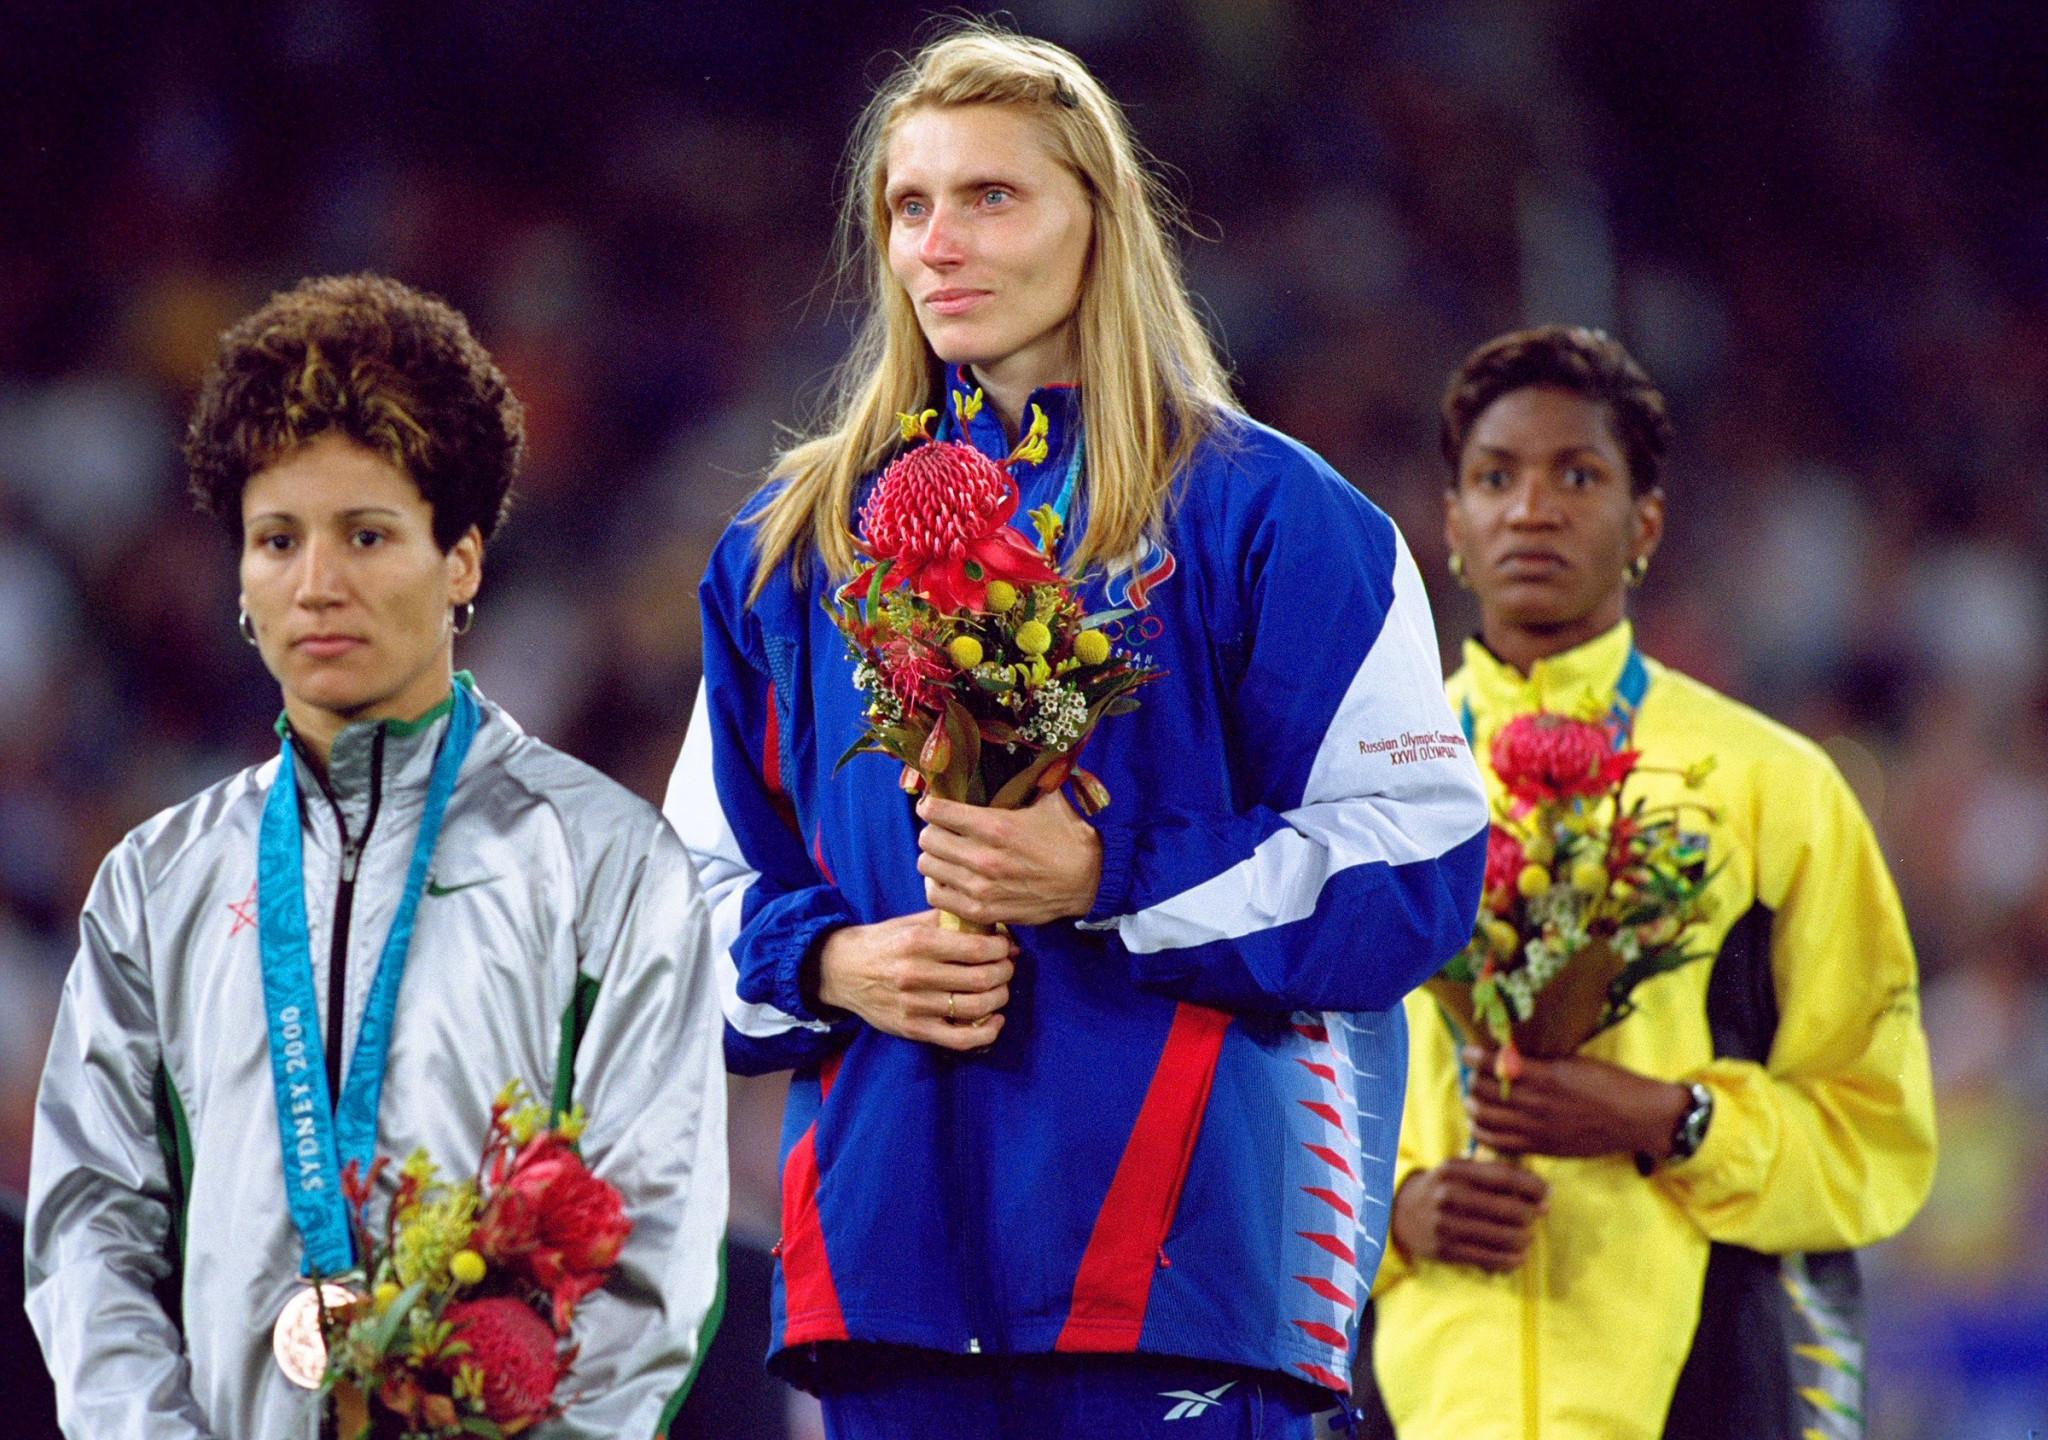 Four-time Olympic medallist Privalova nominated for RusAF Presidency